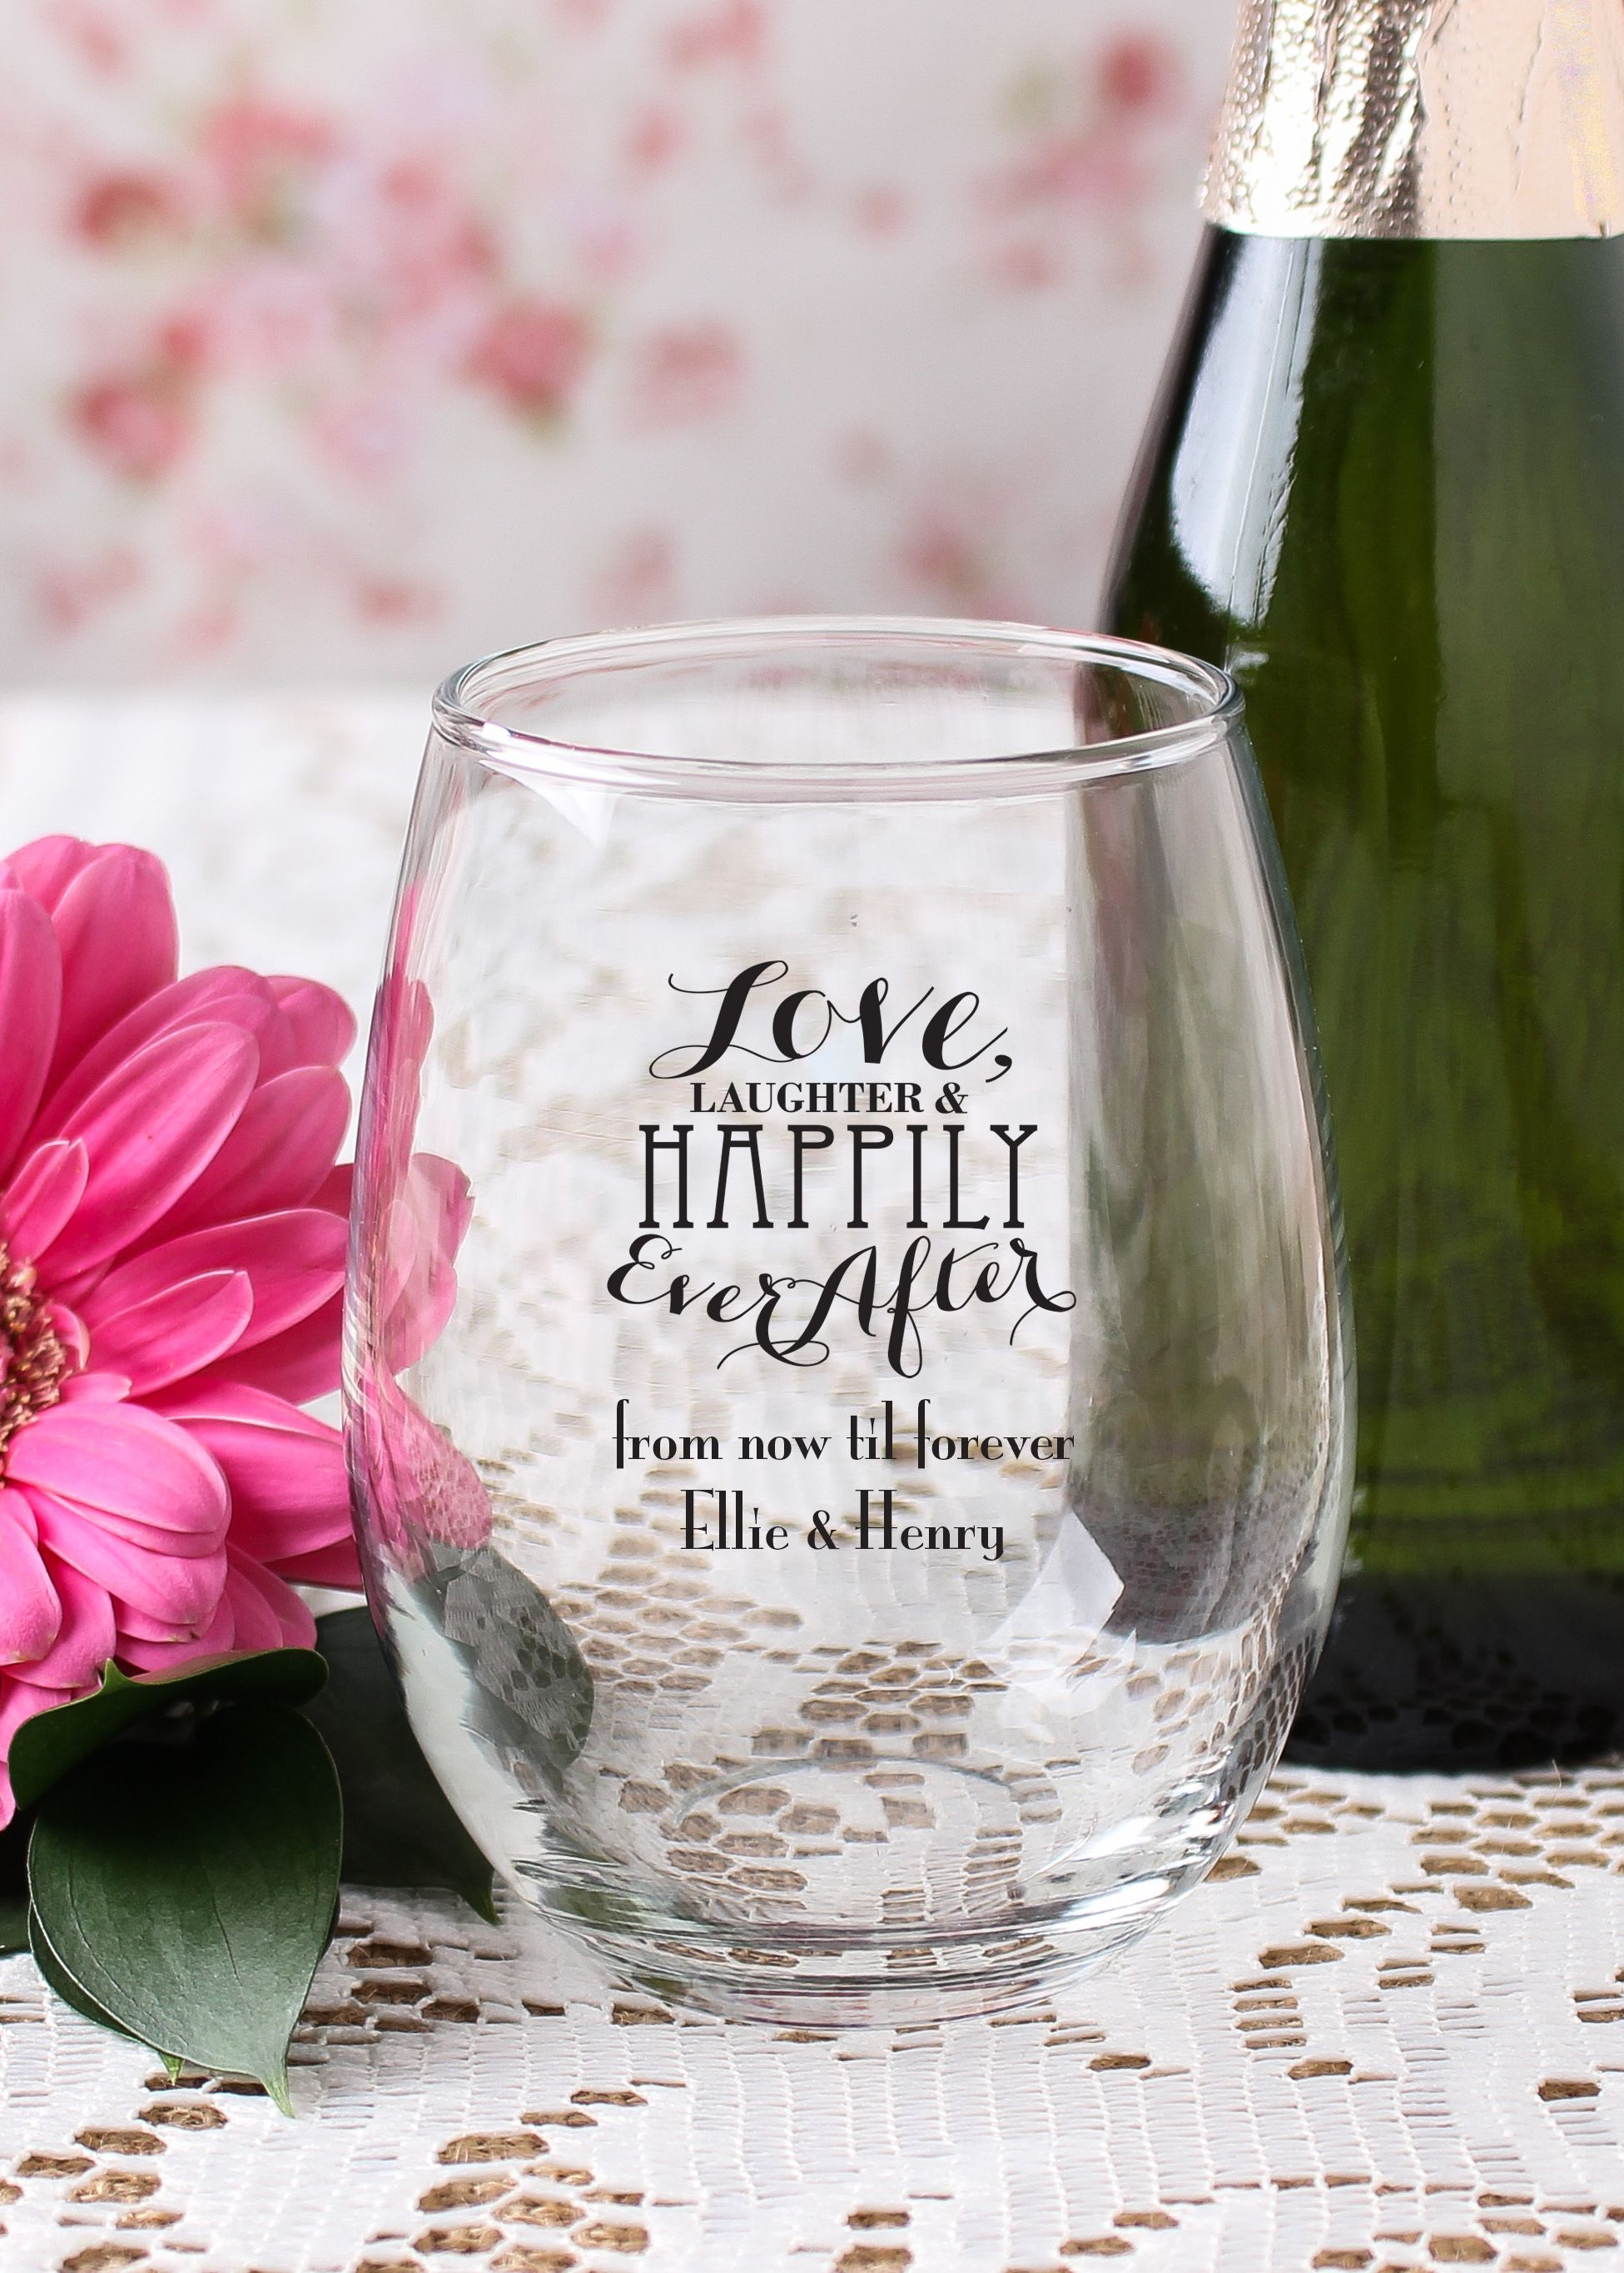 Personalized 9 oz. Stemless Wine Glass | Wedding, Wedding and Bridal ...